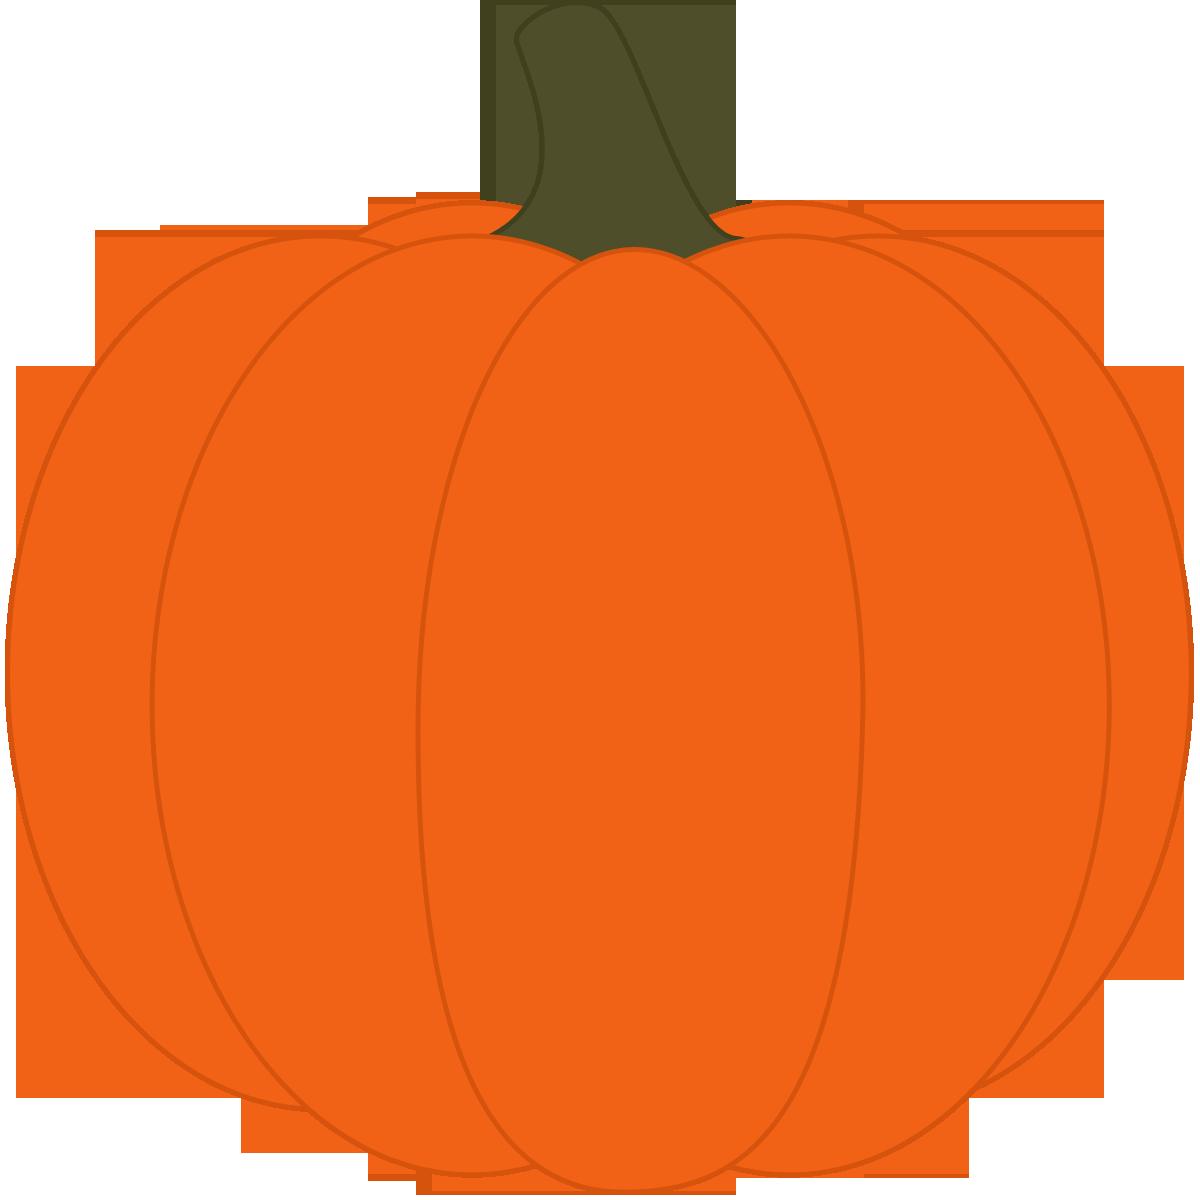 Pumpkin Clip Art Black And White.